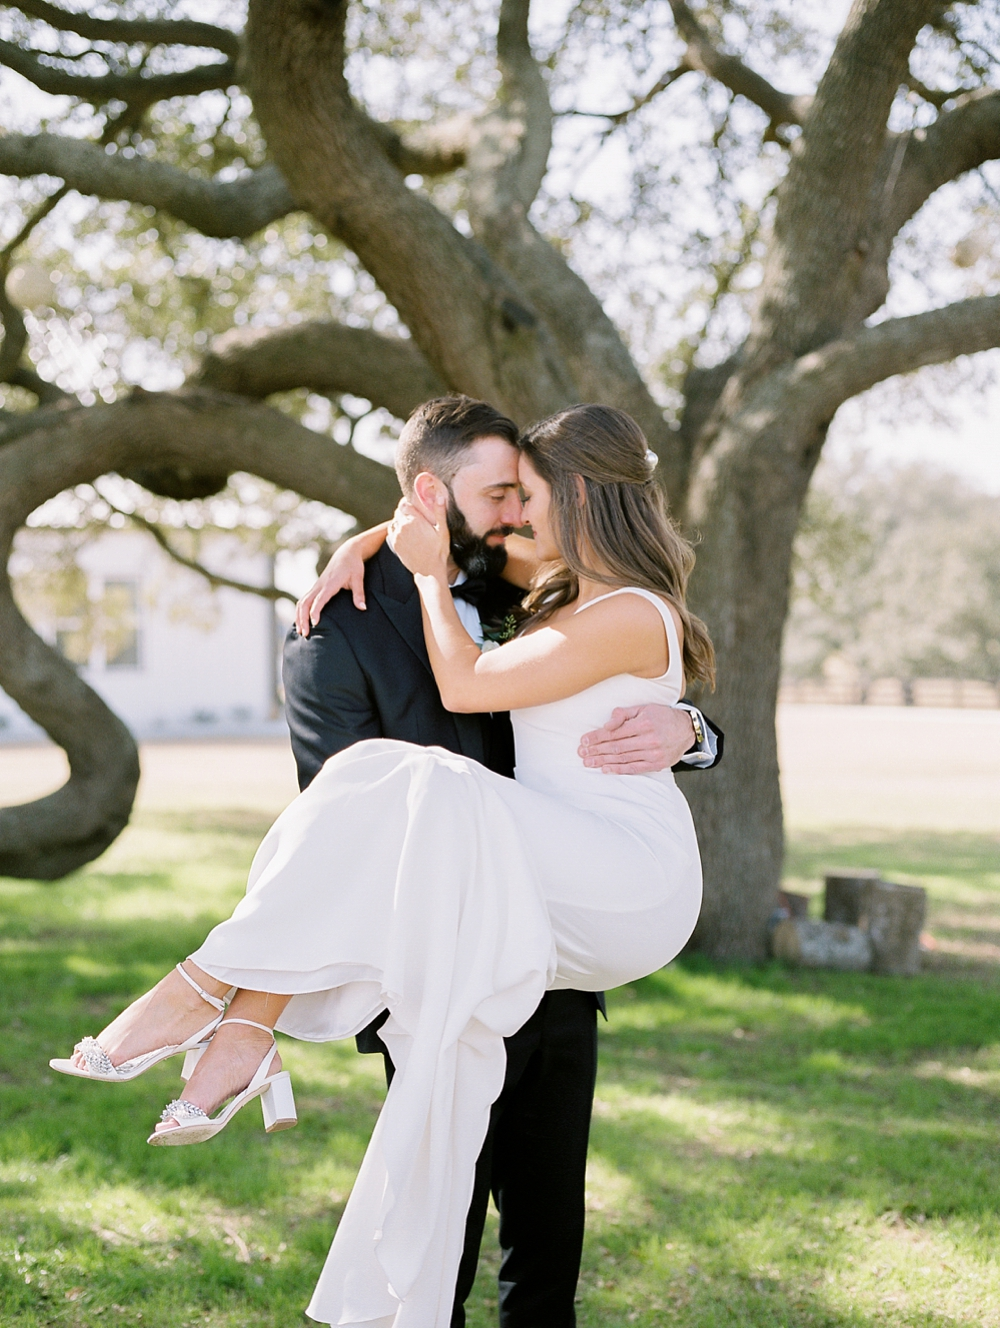 Kristin-La-Voie-Photography-austin-houston-texas-wedding-photographer-the-oaks-at-high-hill -256